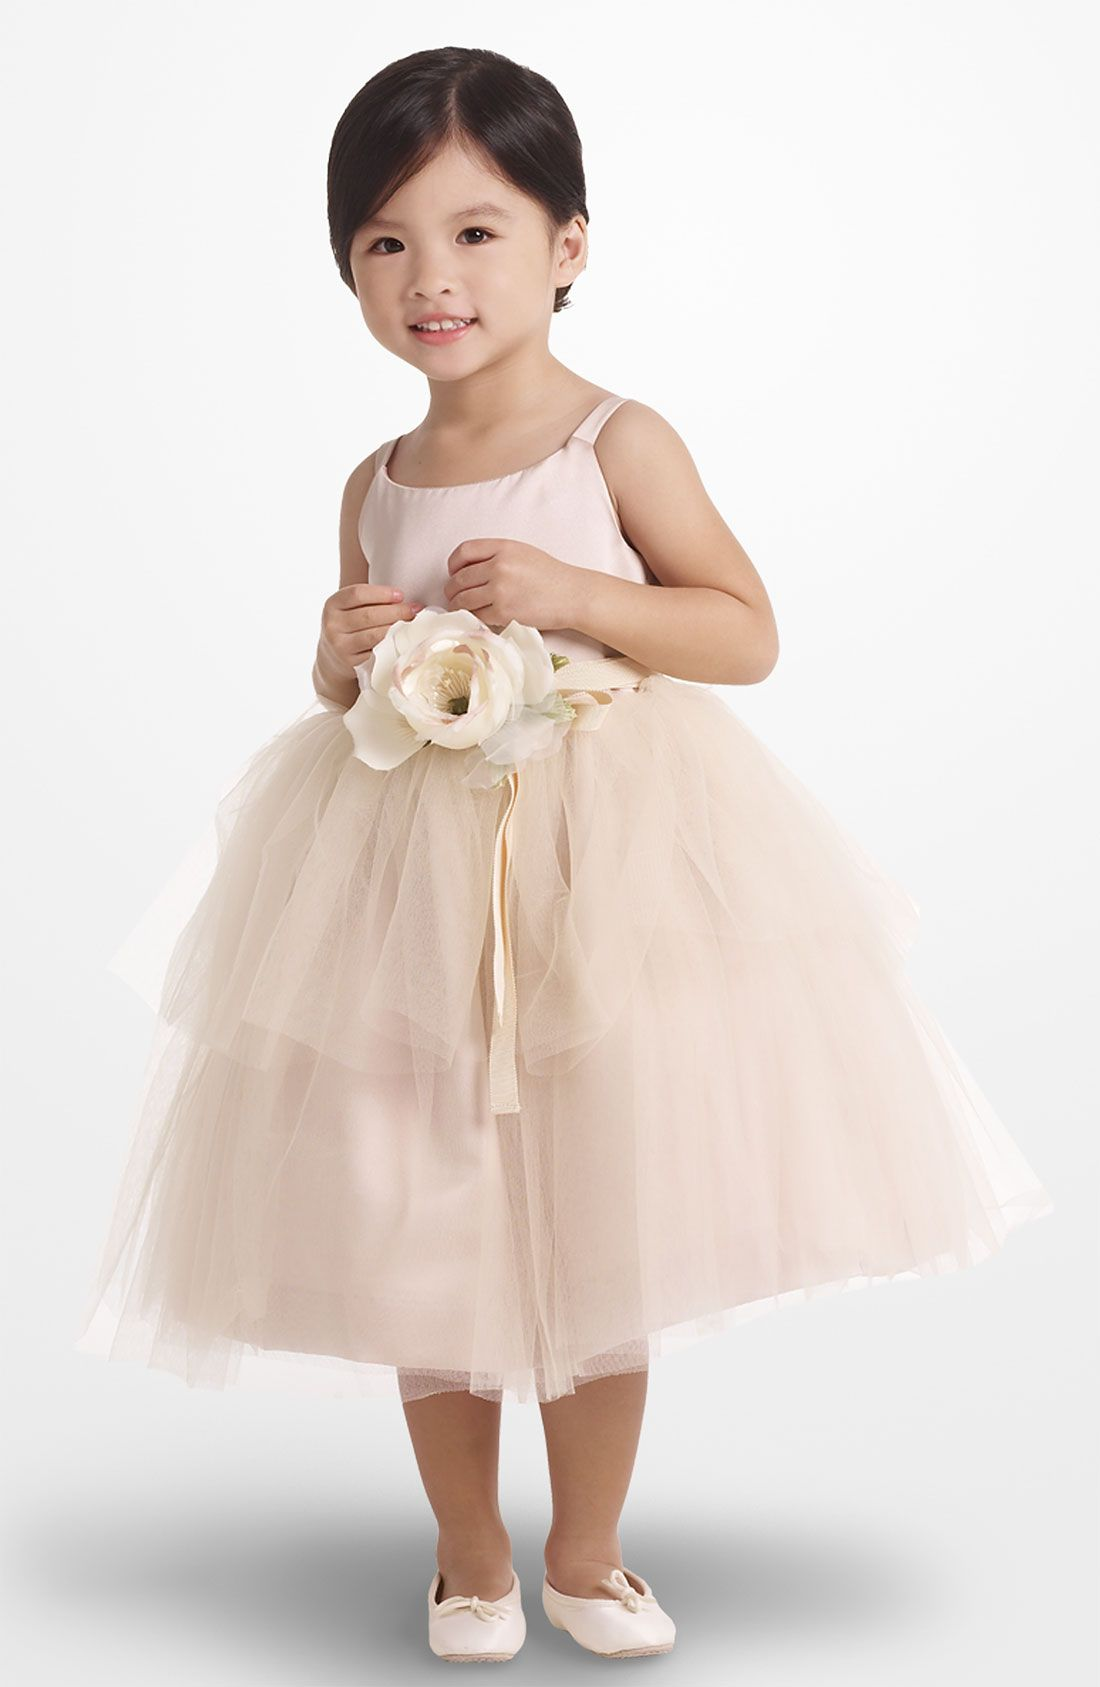 Wedding Toddler Flower Girl Dresses tulle ballerina dress toddler girls and the sweetest flower girl simple high quality love soft pink